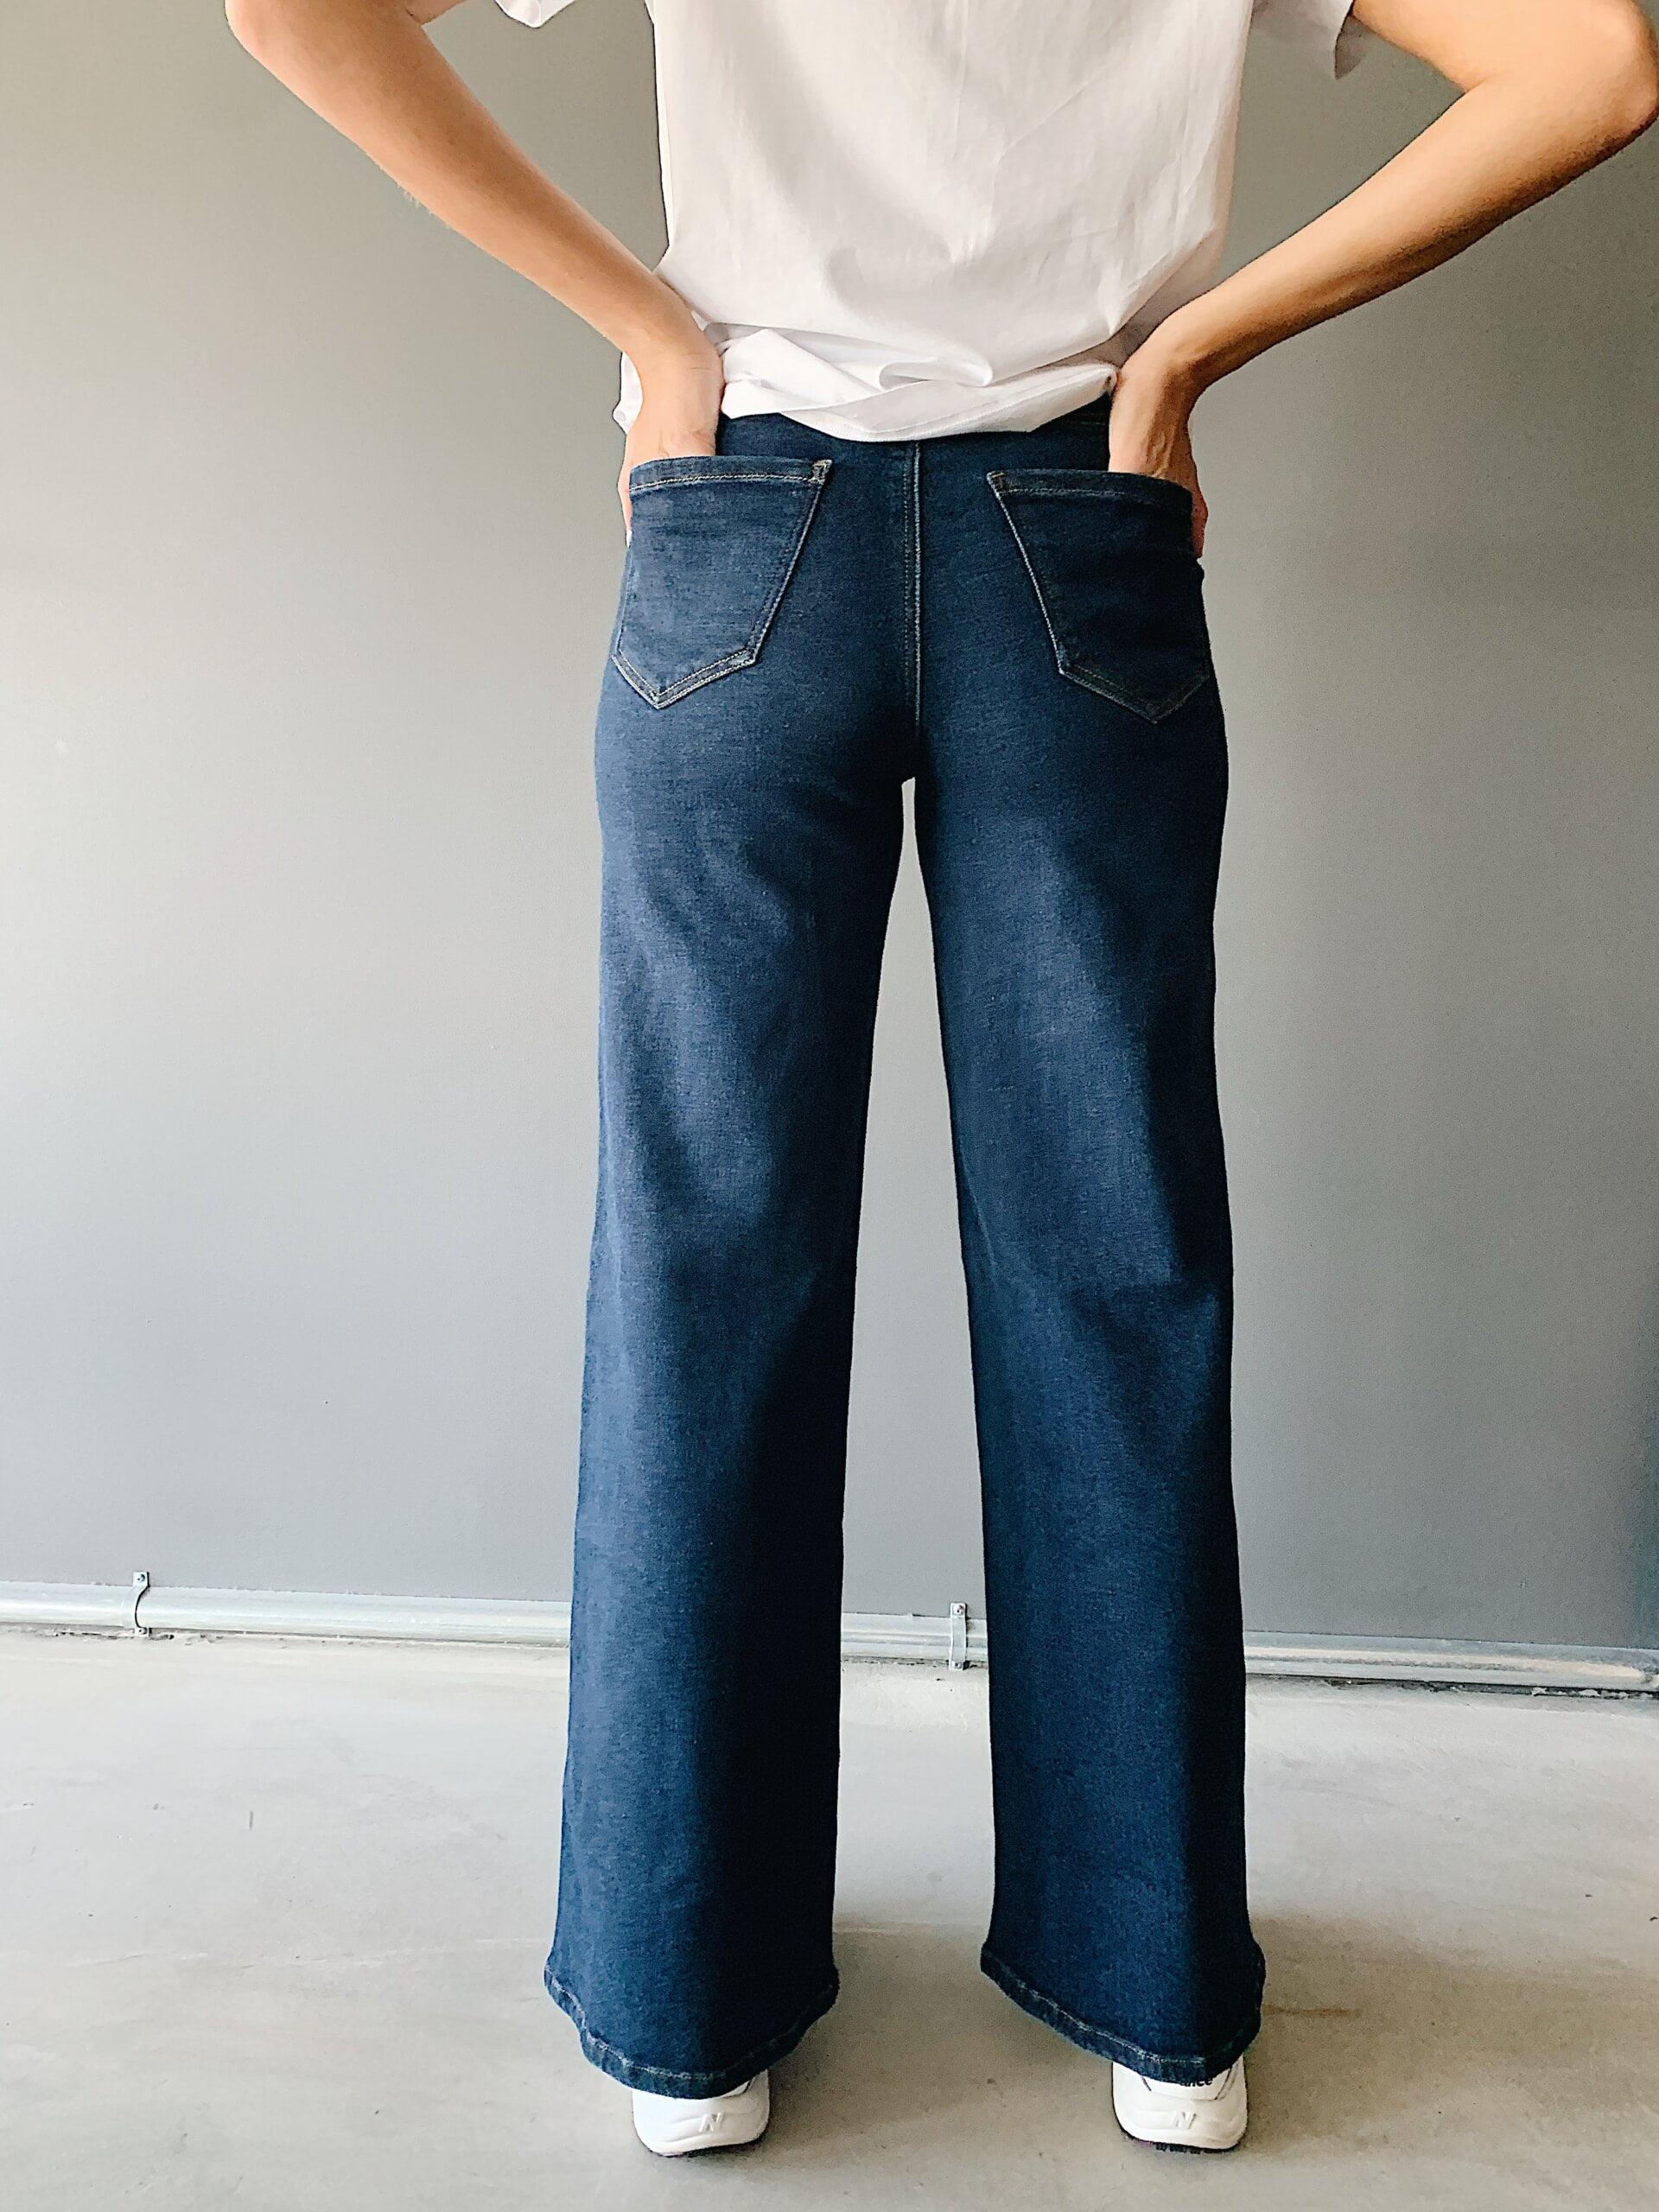 Harper wide jeans